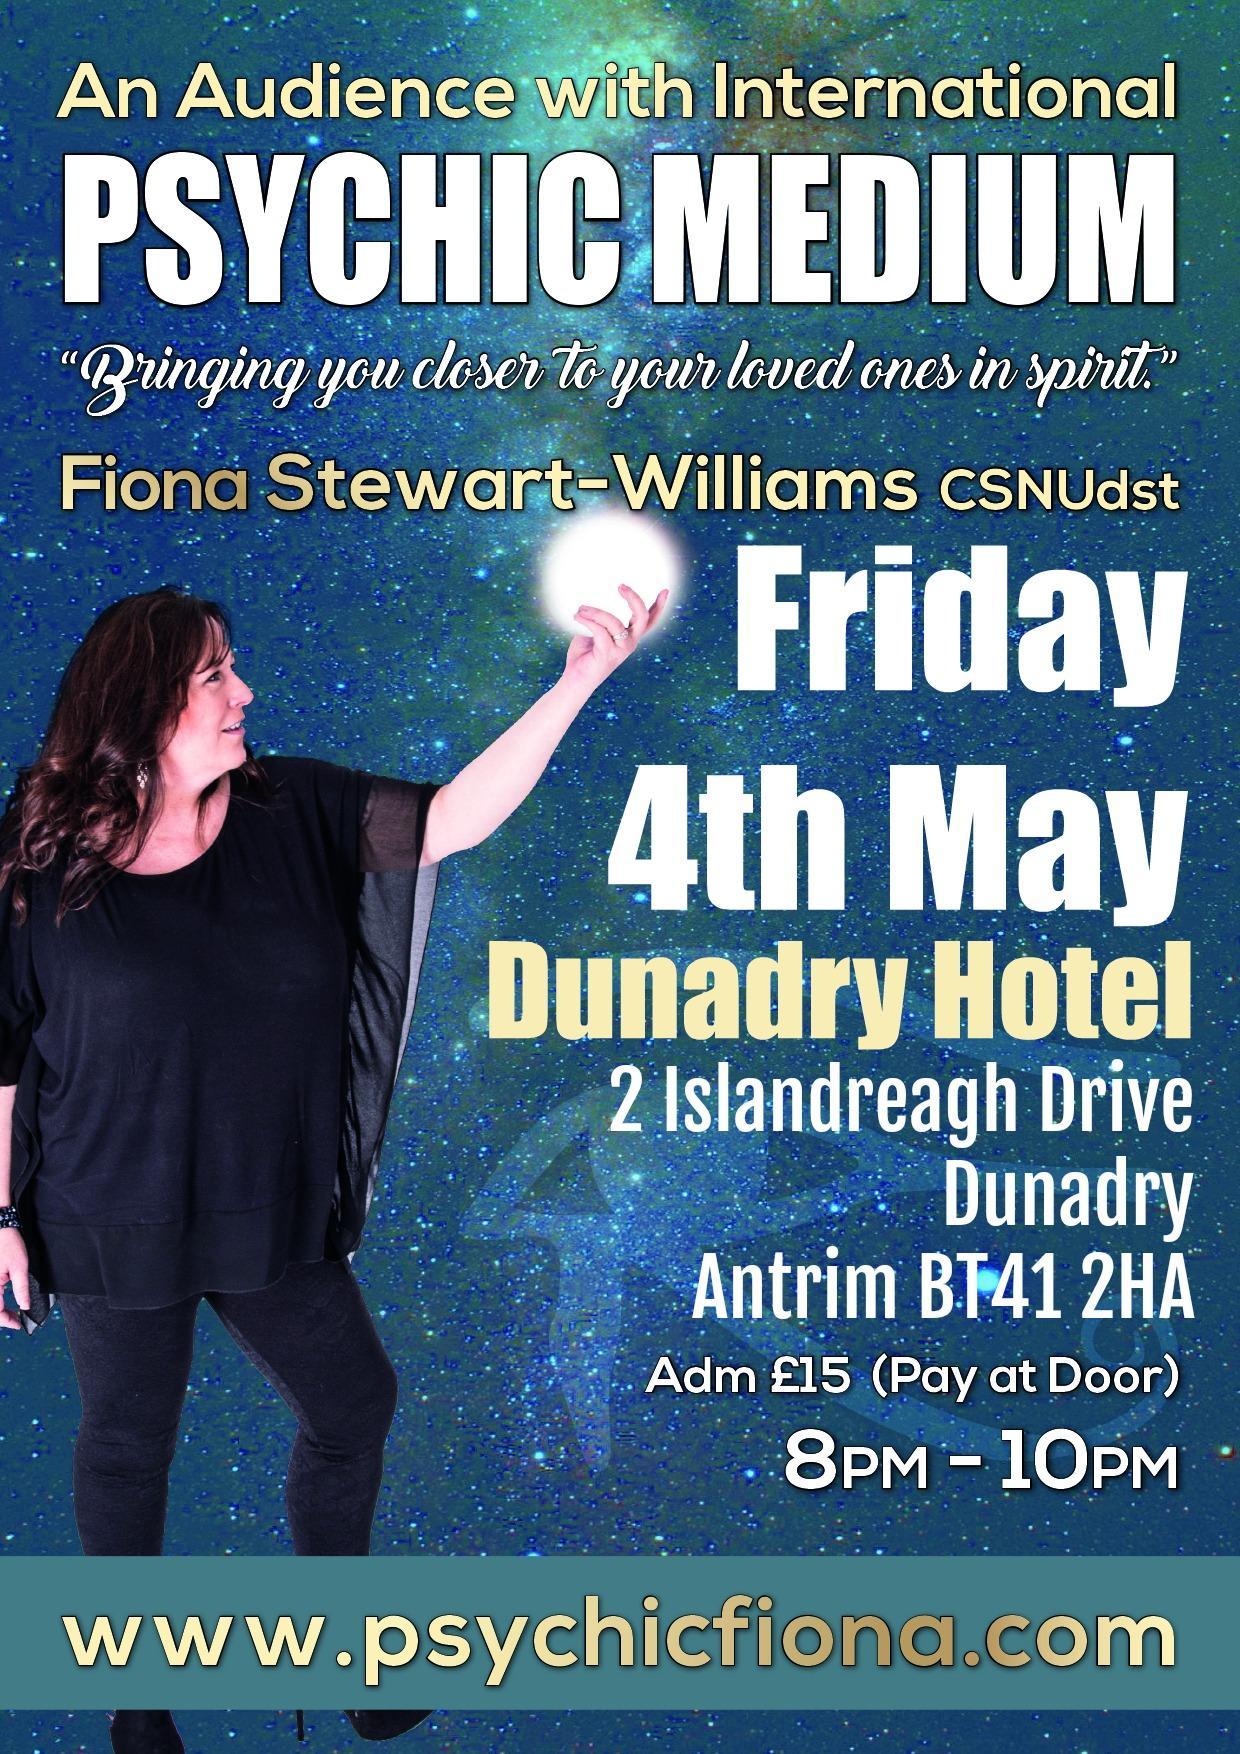 Psychic Night at the Dunadry Hotel Antrim